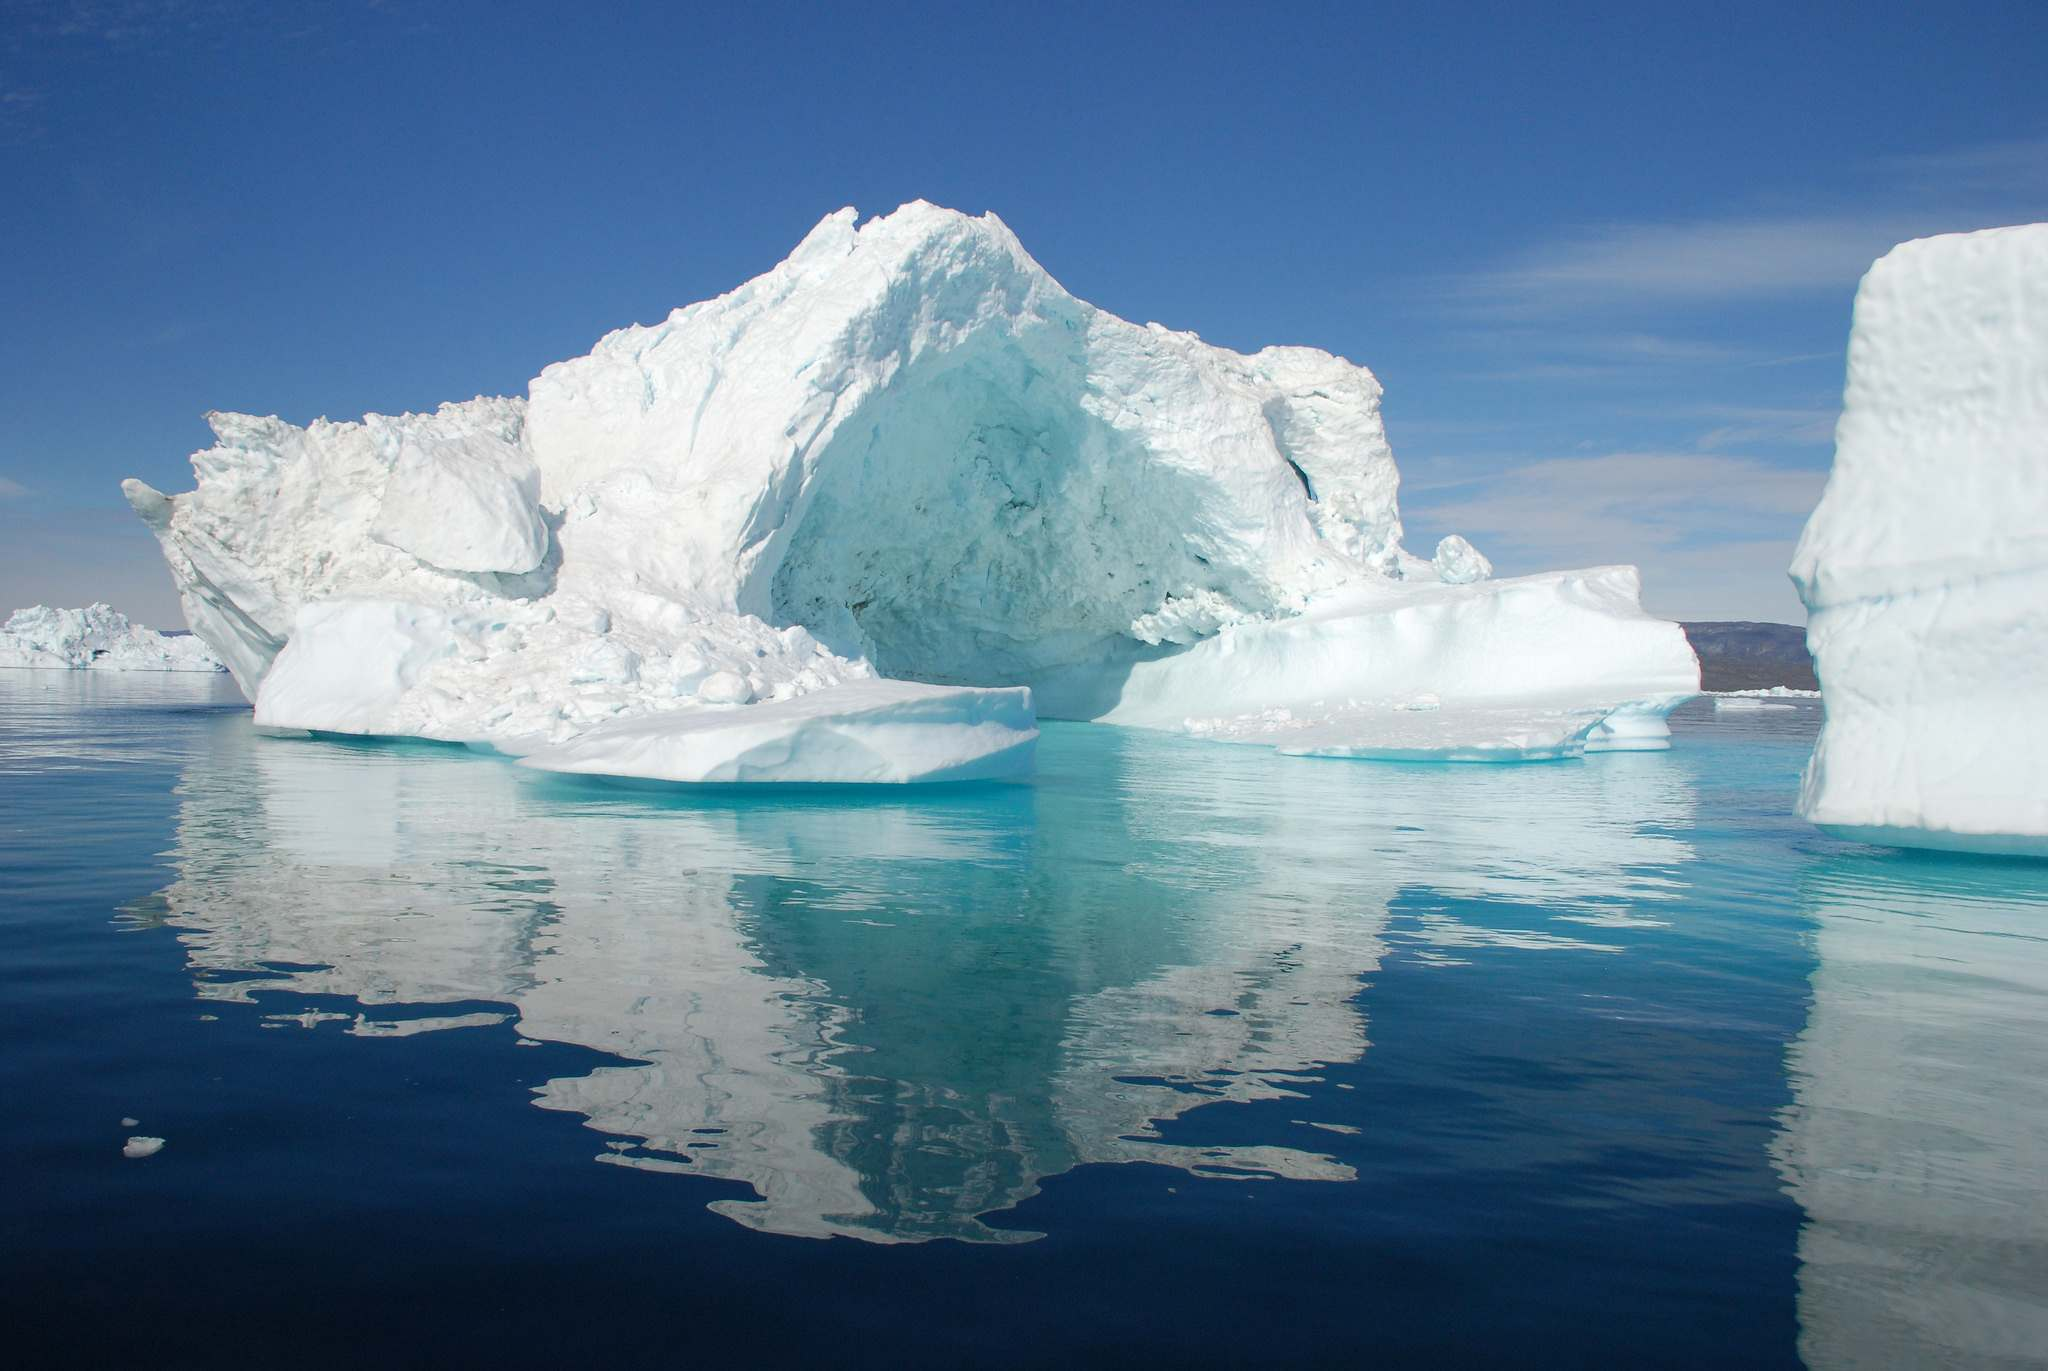 icefjord ilulissat4 The icefjord in Ilulissat, Greenland